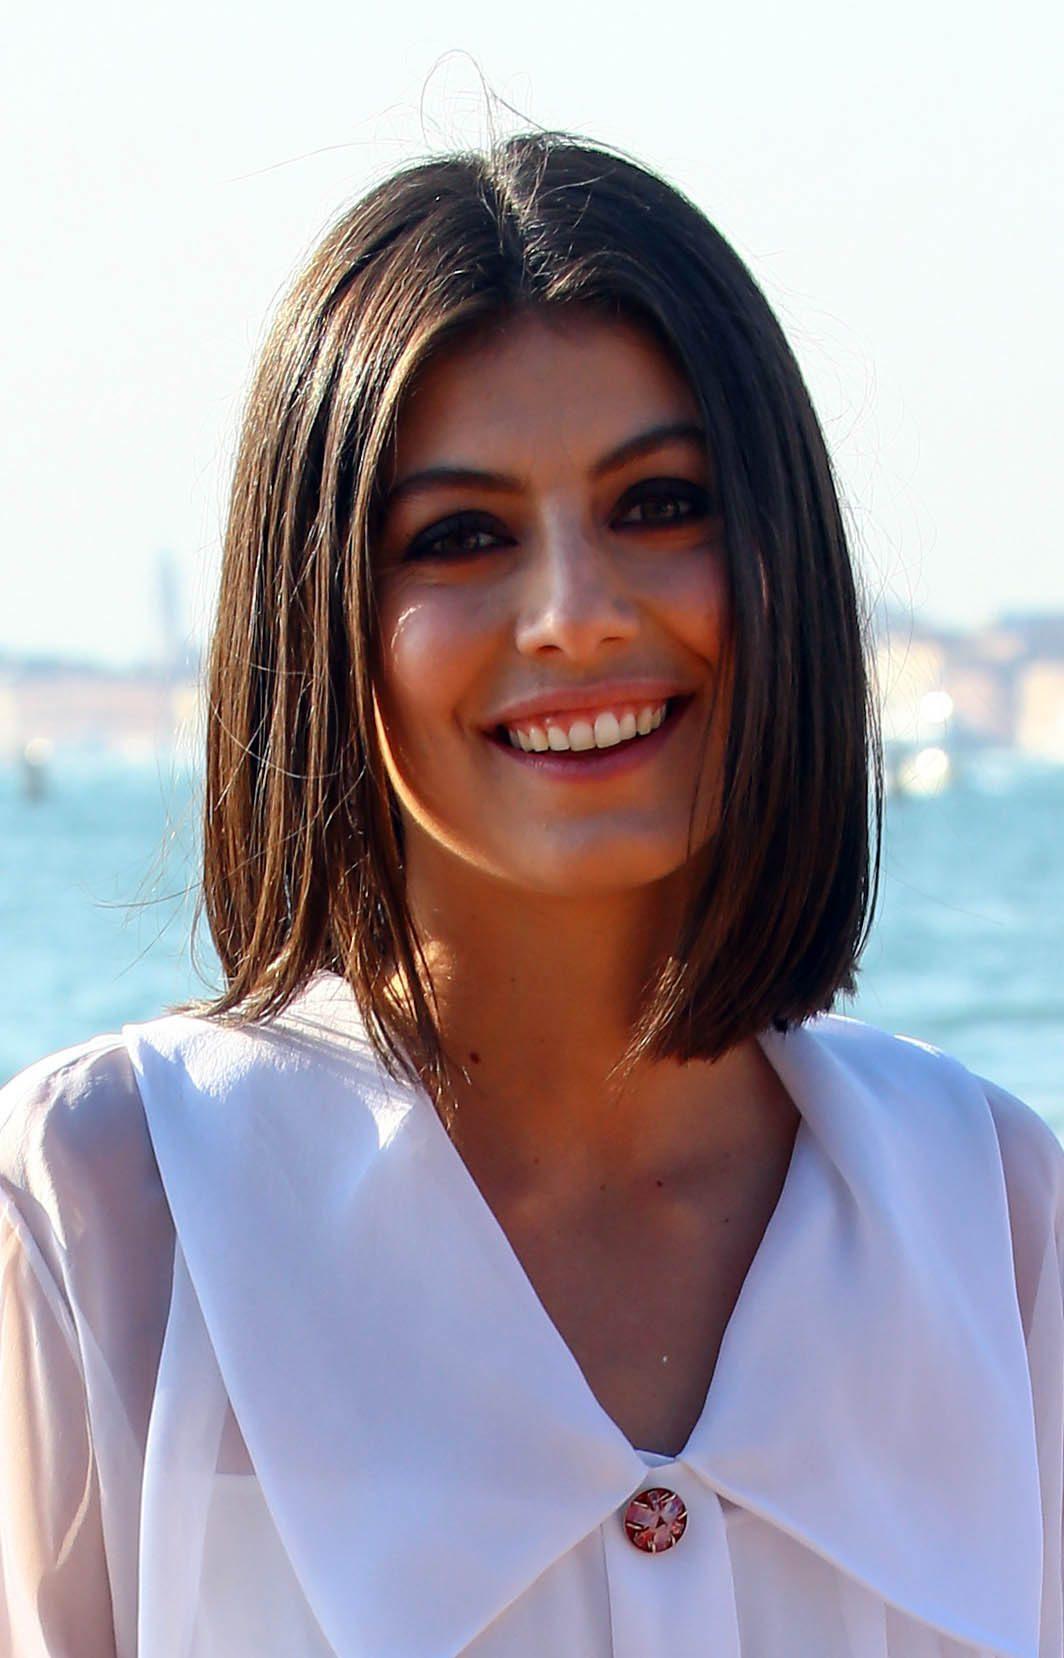 Alessandra Mastronardi's Bob